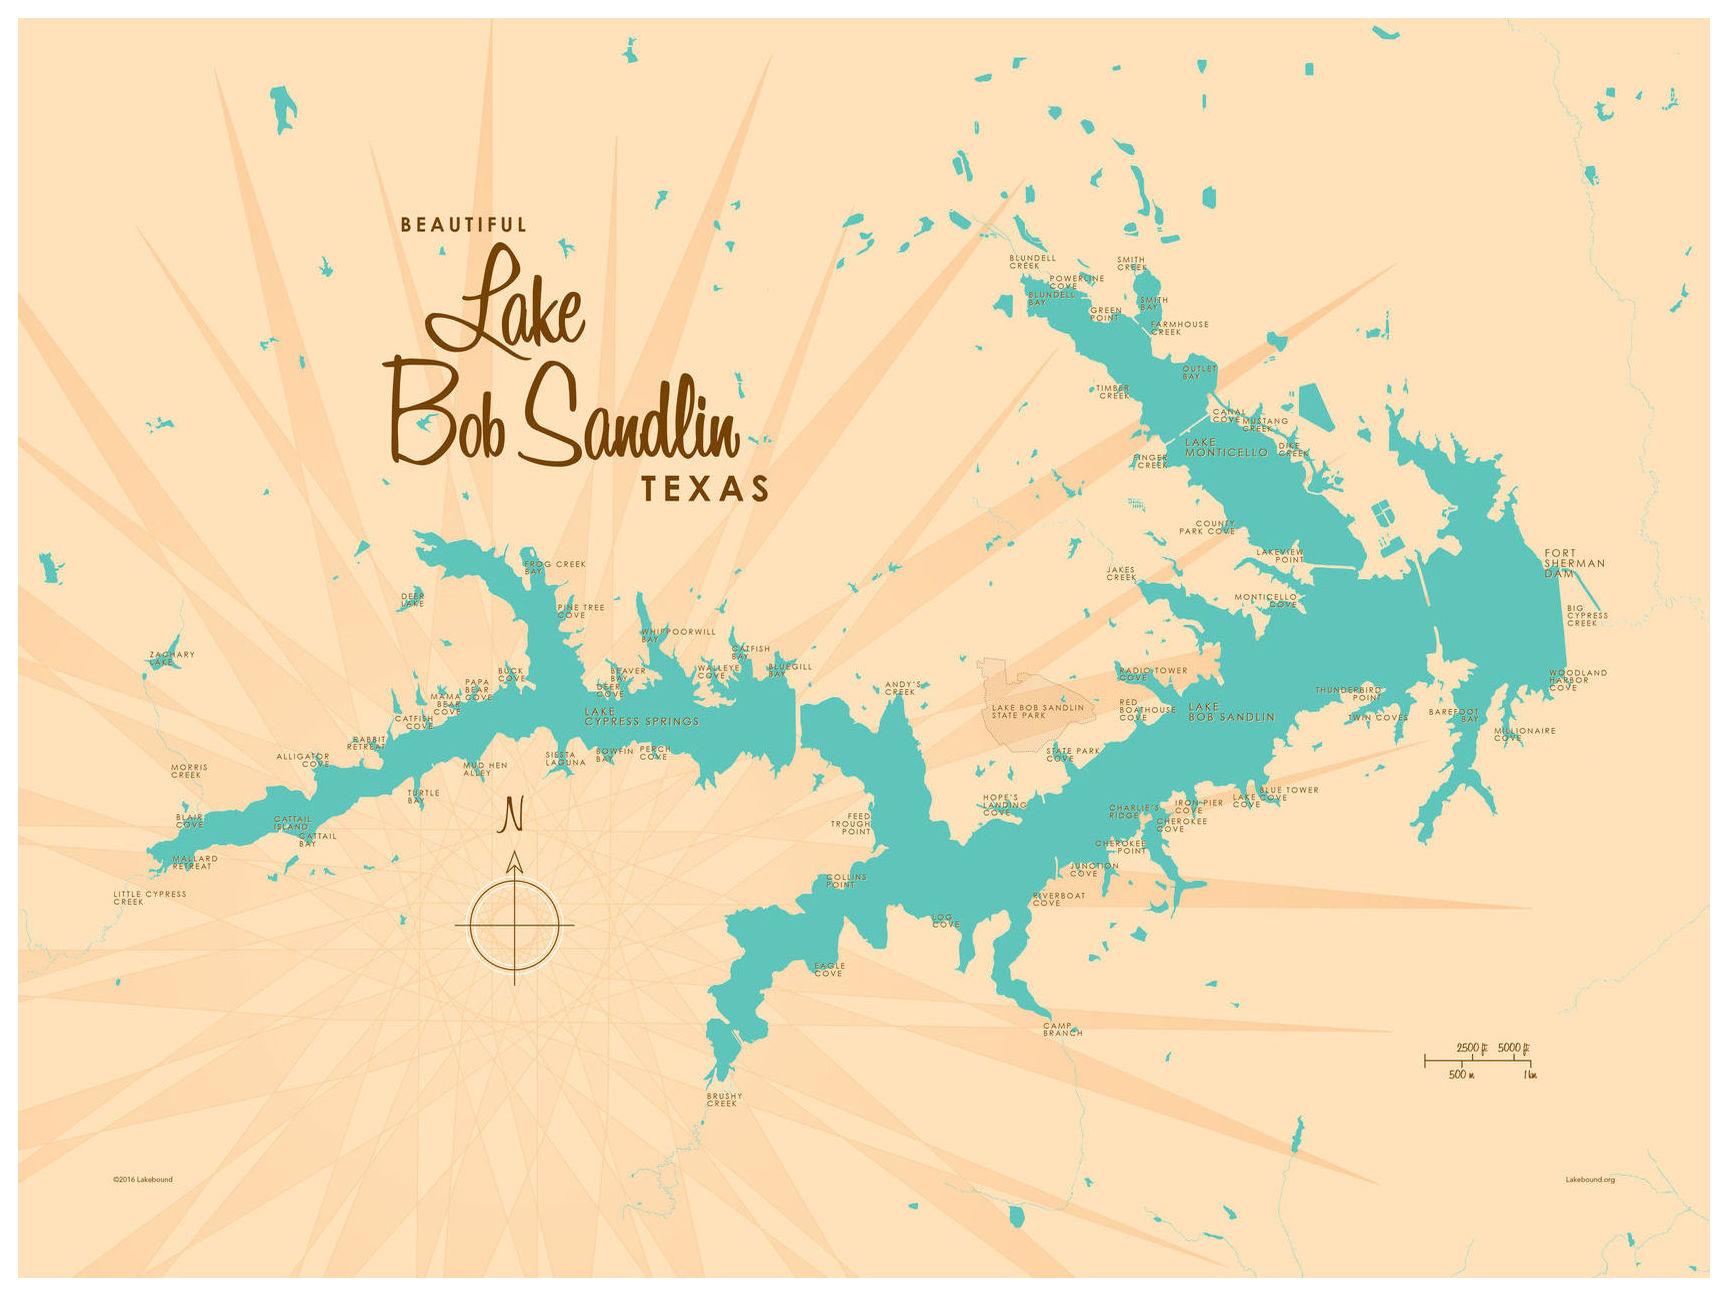 Lake Bob Sandlin Texas Map Vintage-Style Art Printlakebound (9 - Texas Map Art